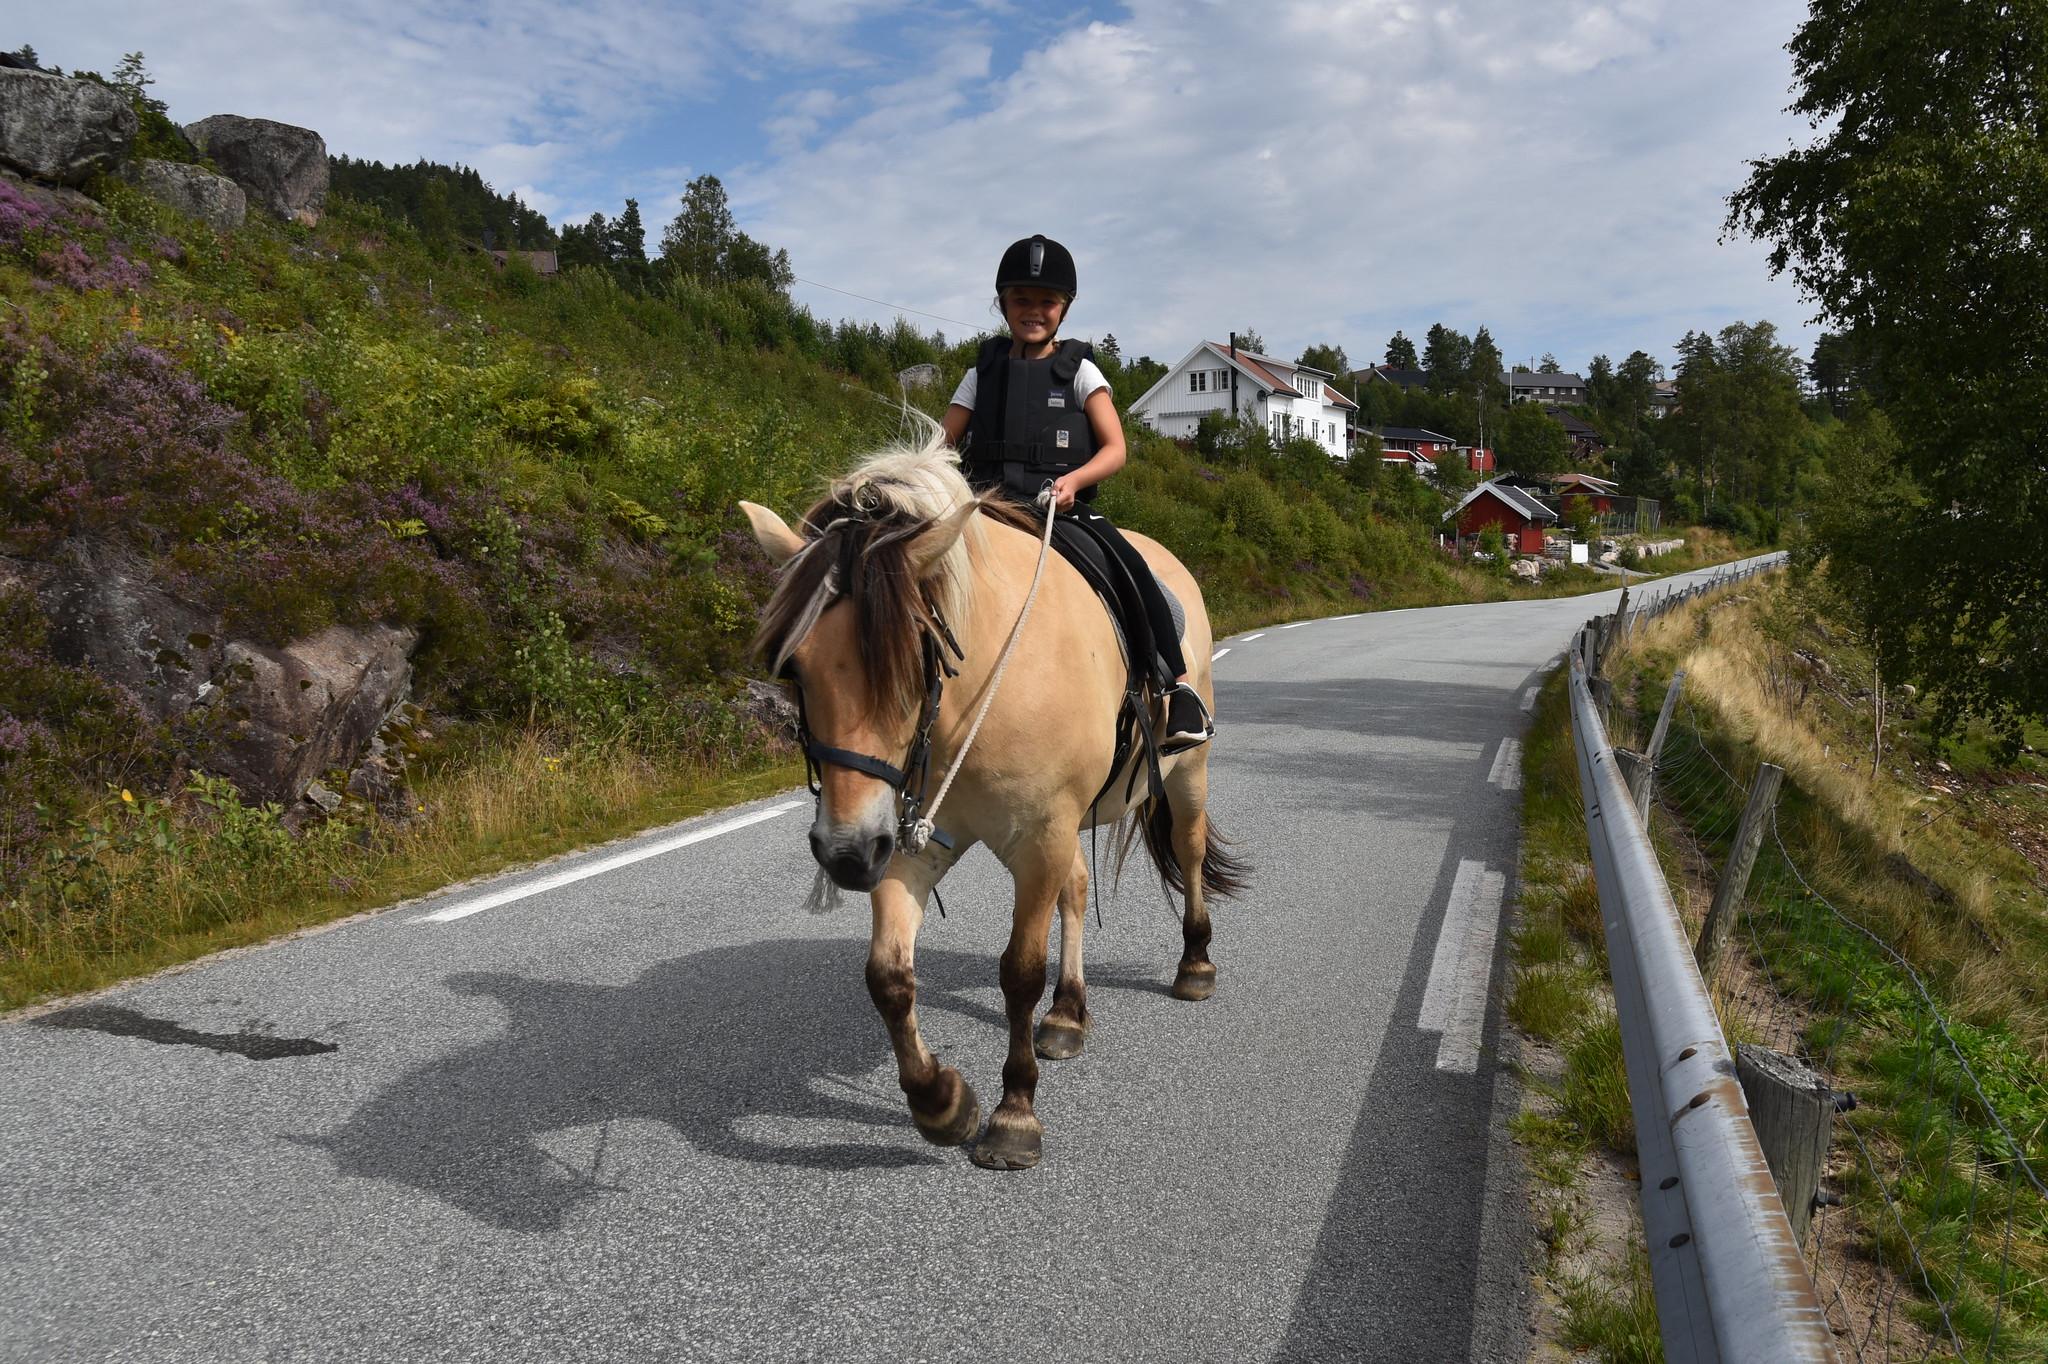 Barnevennlige hester tar deg trygt rundt i området. Foto: Elisabeth Høibo©Visit Sørlandet